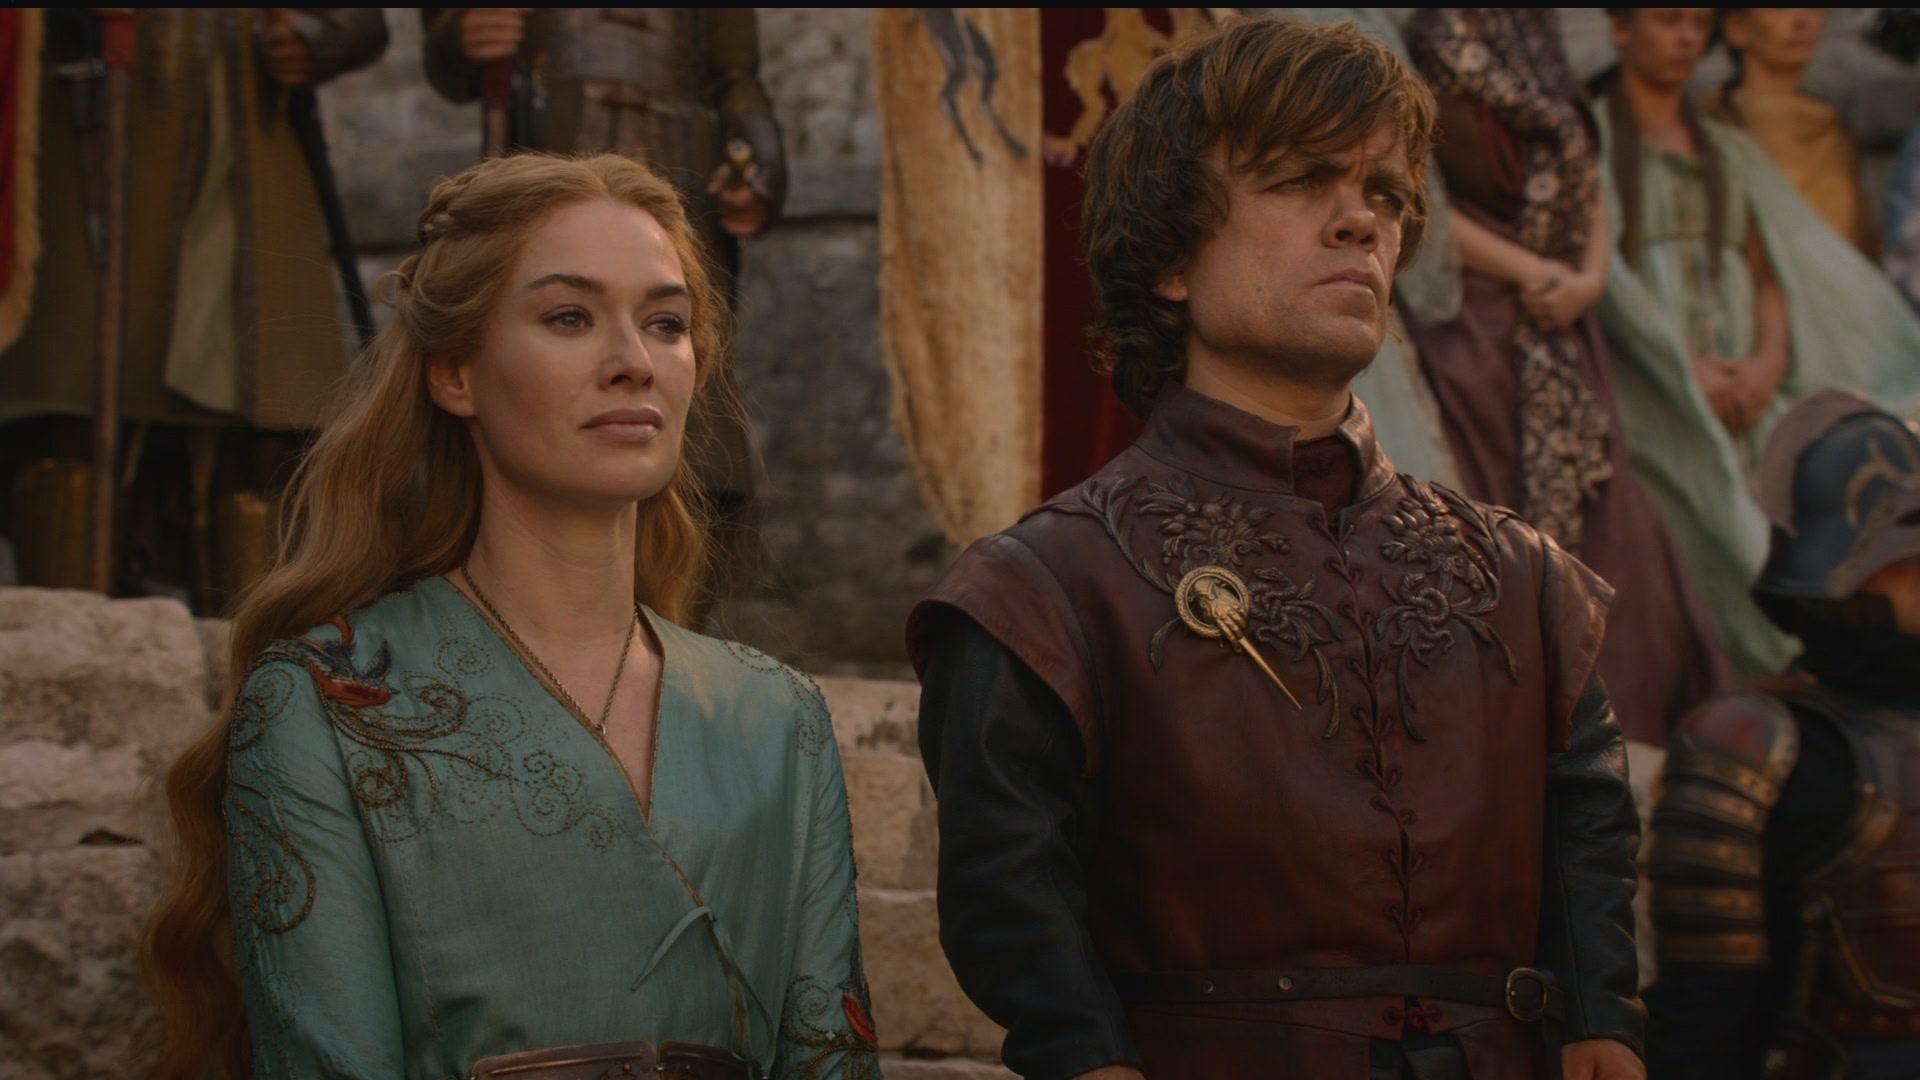 Download Game of Thrones Season 2